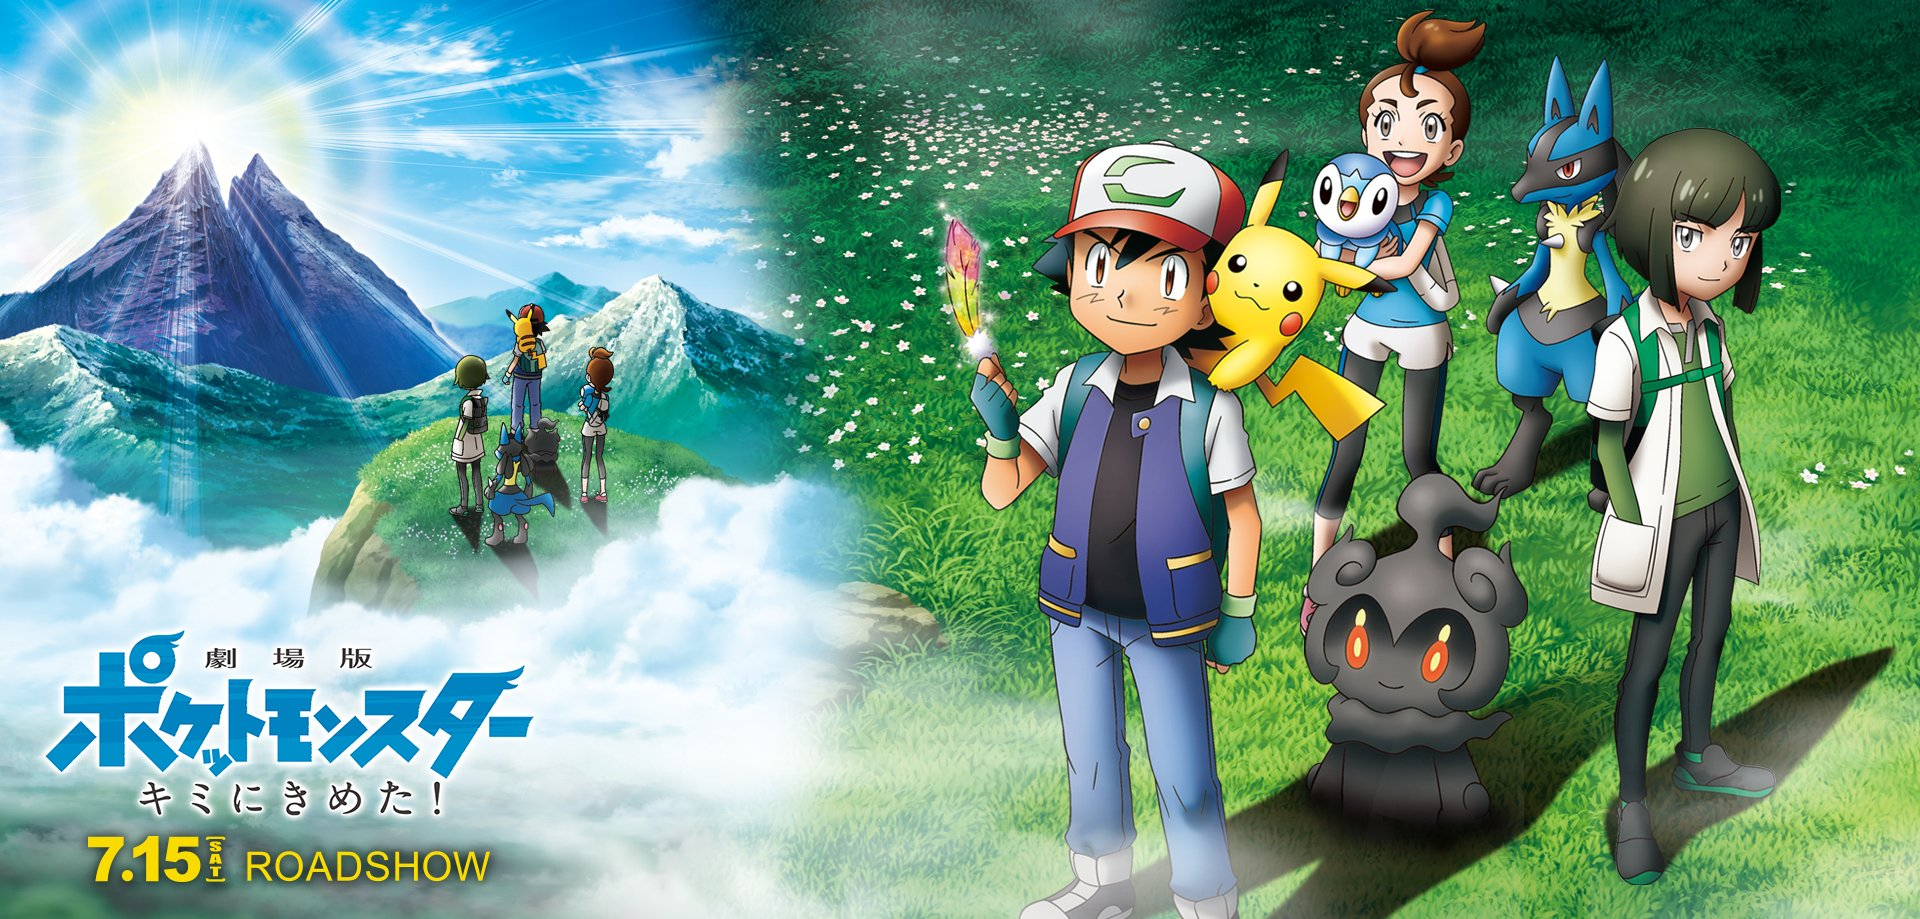 PokéNews (May 16): Pokémon Shuffle / Pokémon Sun and Moon